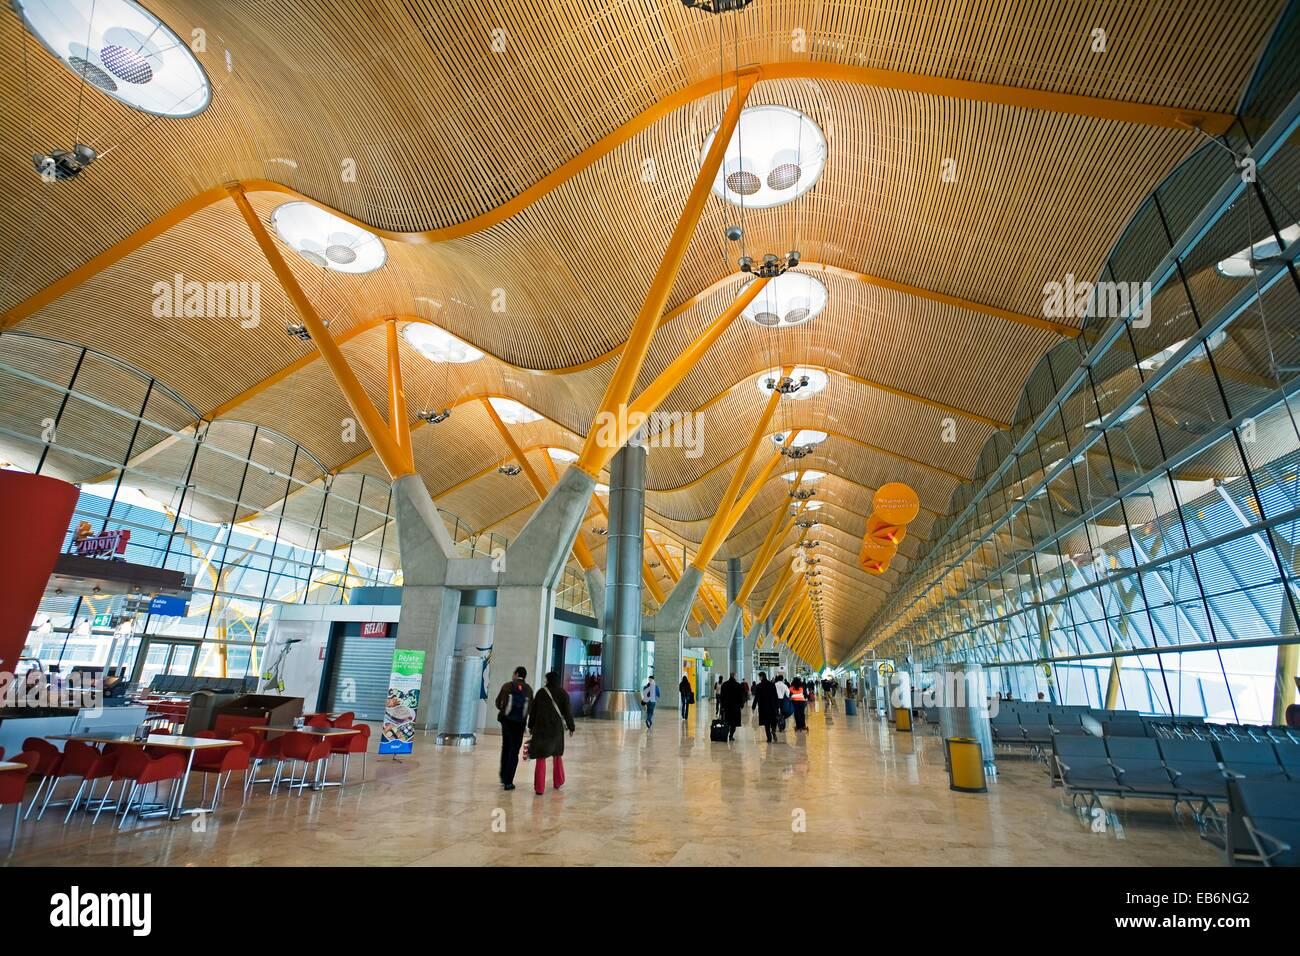 Madrid International Airport: photos and descriptions, terminals, flights and passenger reviews 8